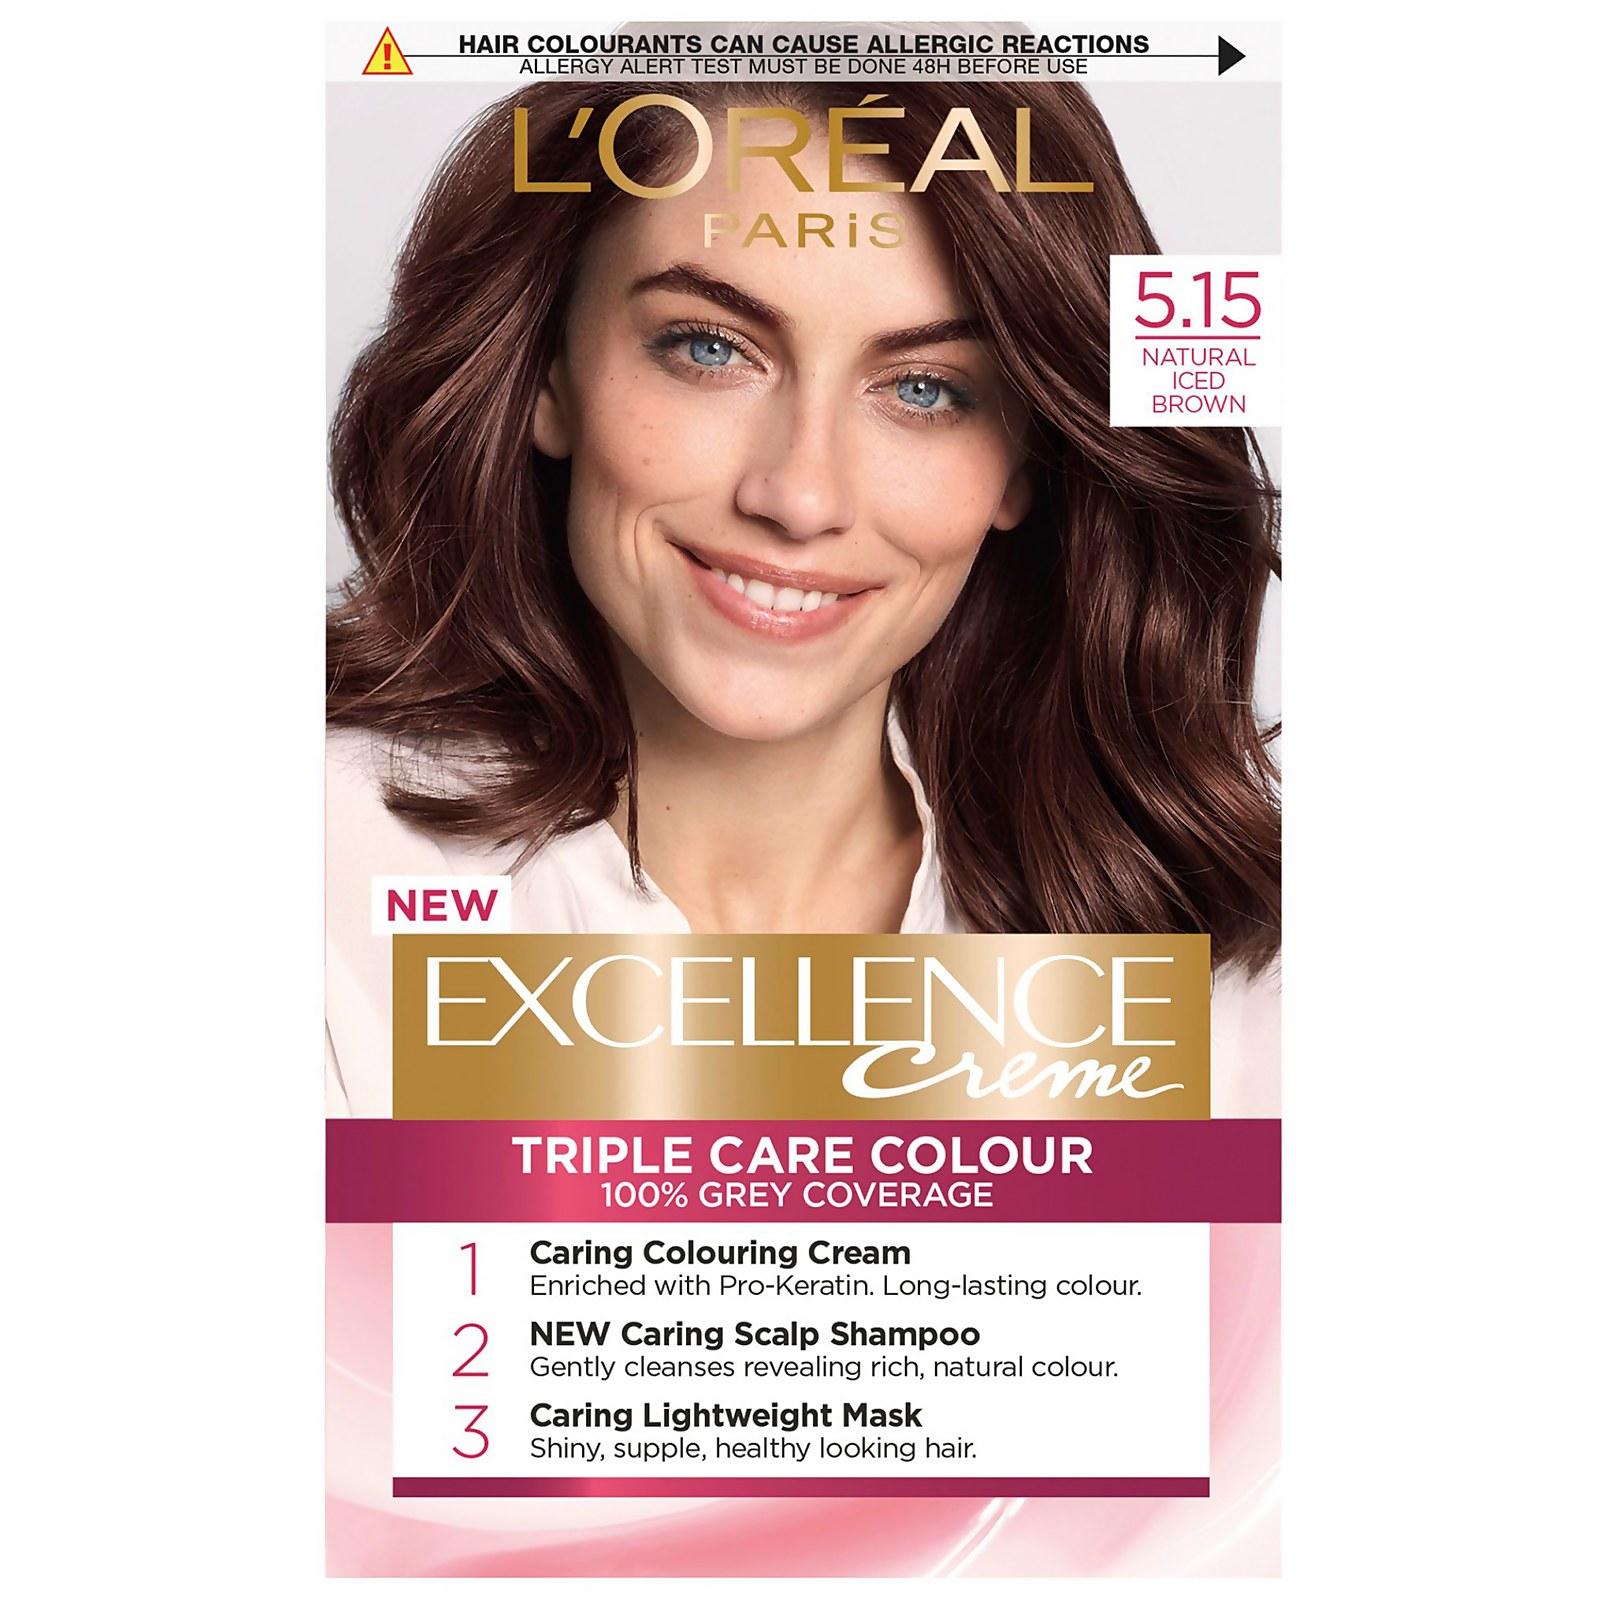 L'Oréal Paris Excellence Crème Permanent Hair Dye (Various Shades) - 5.15 Natural Iced Brown